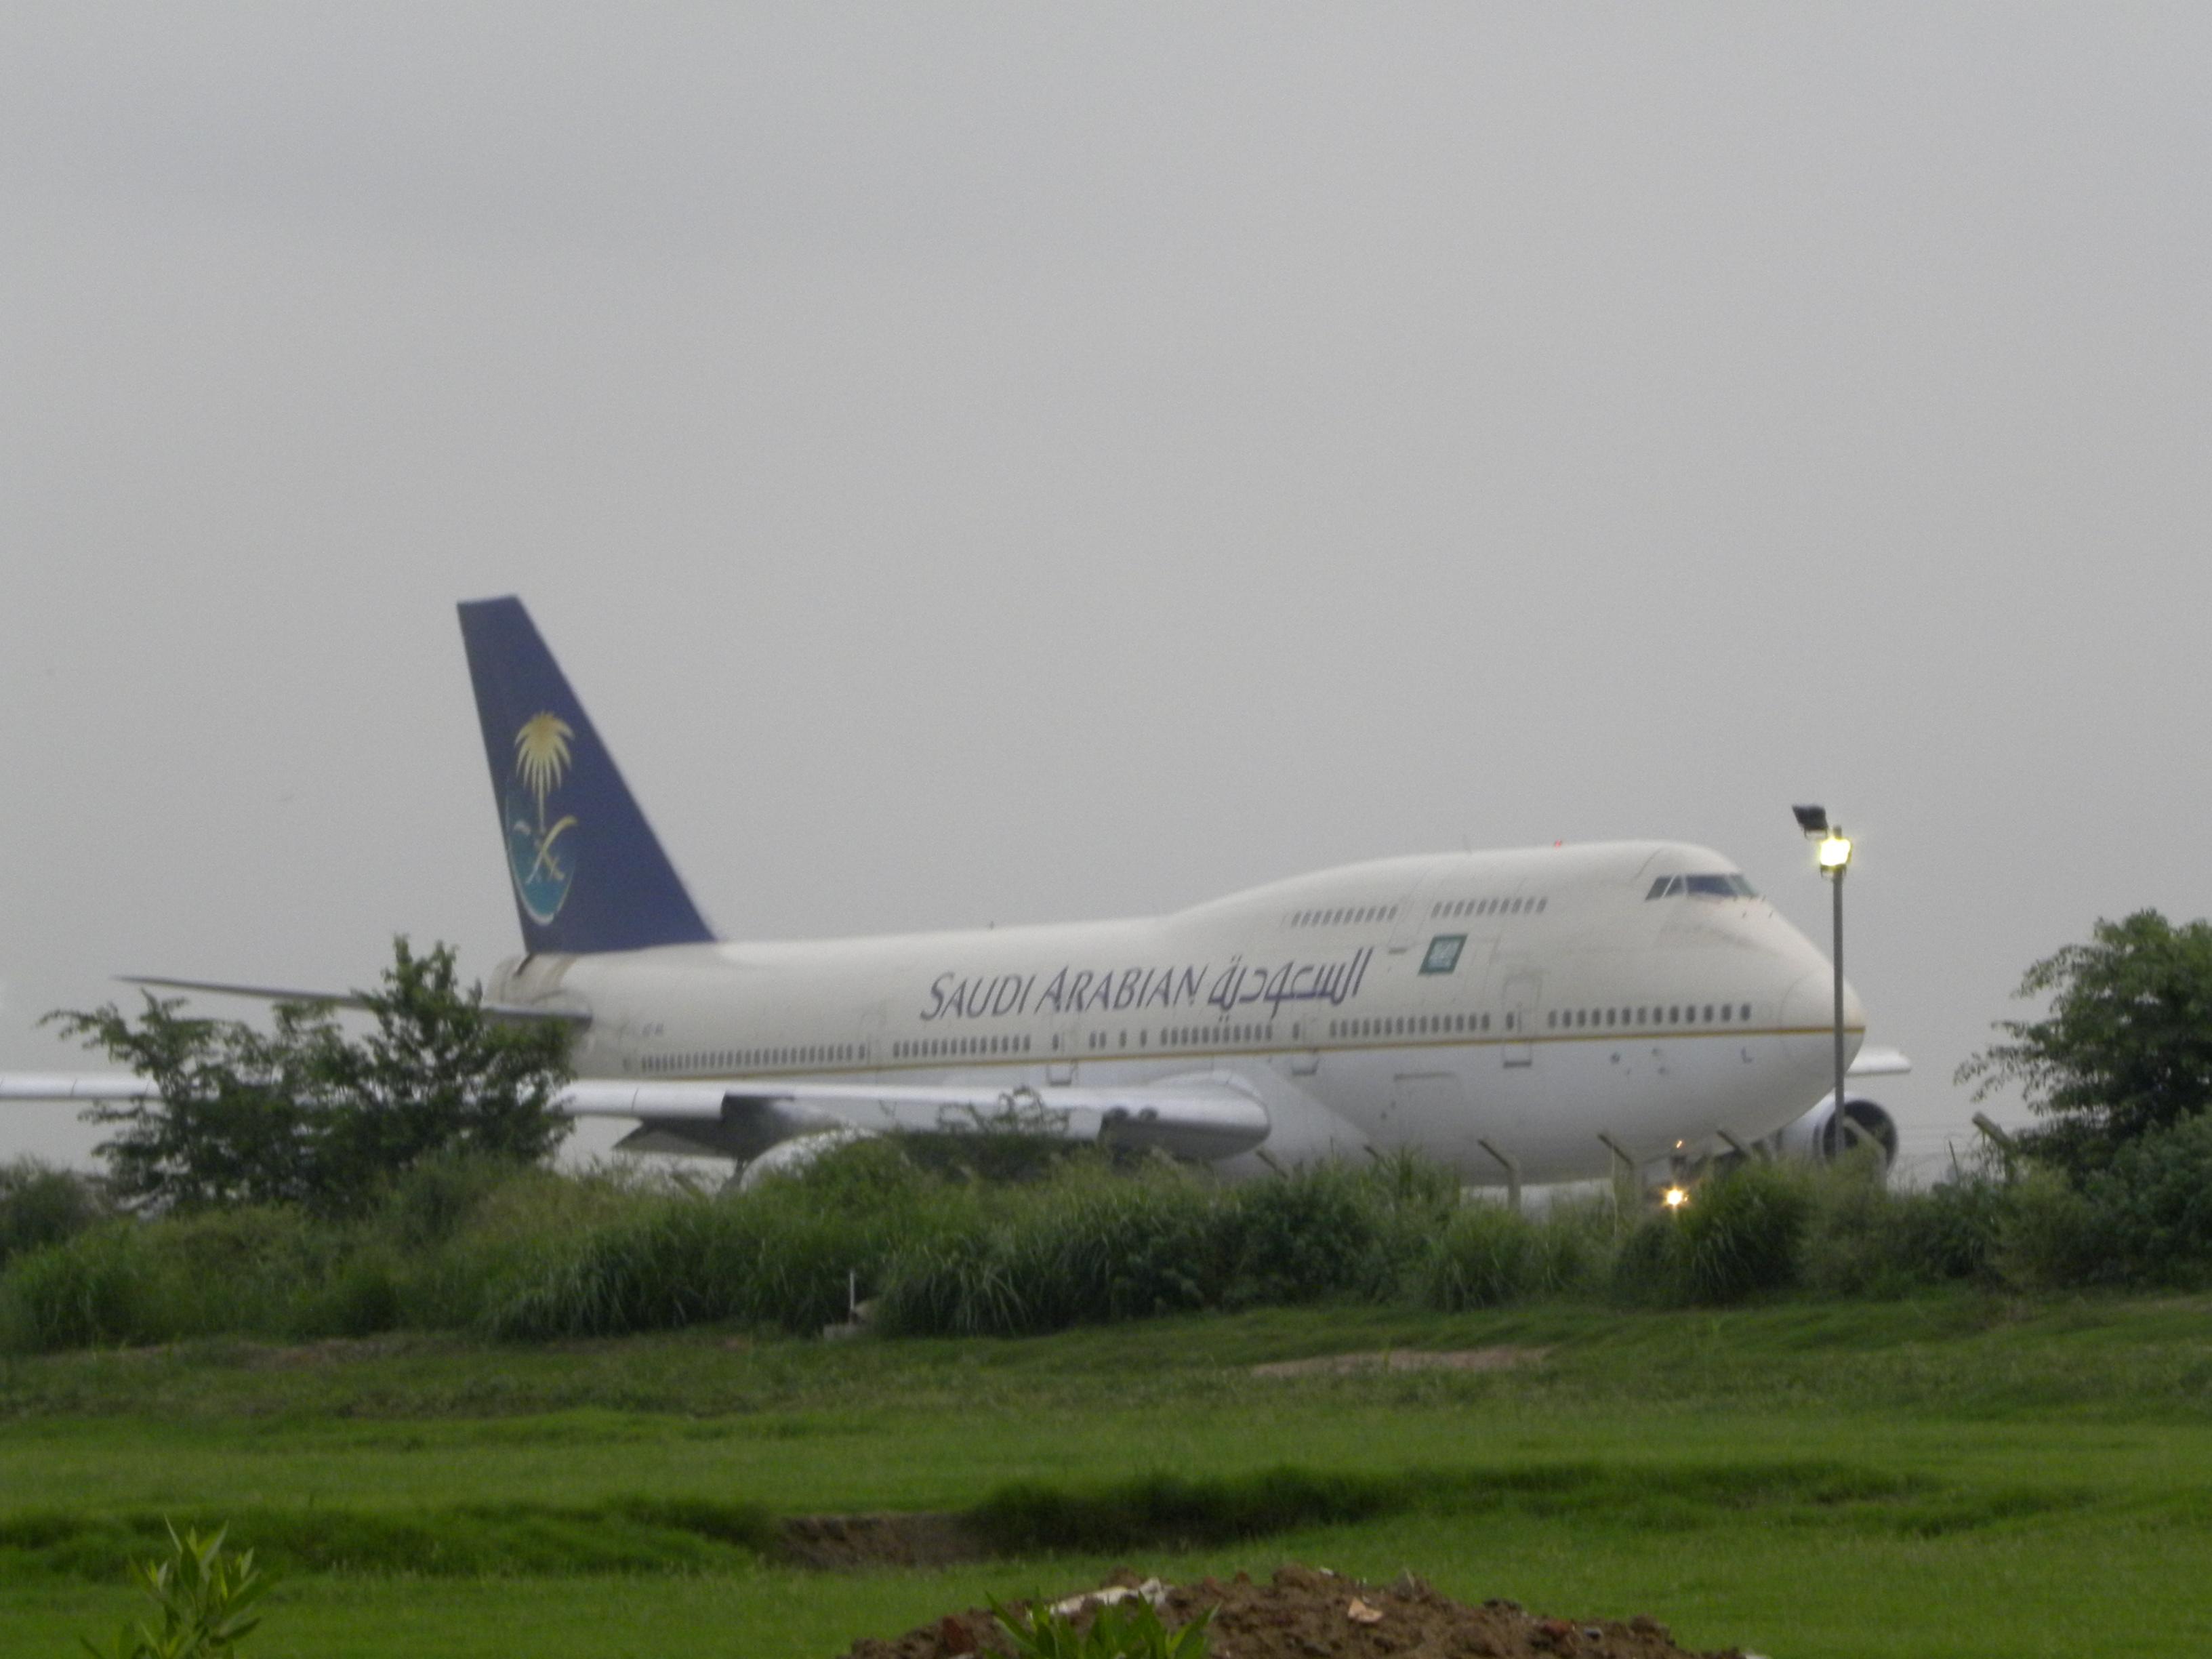 Saudi Arabia Airline Carry On Luggage